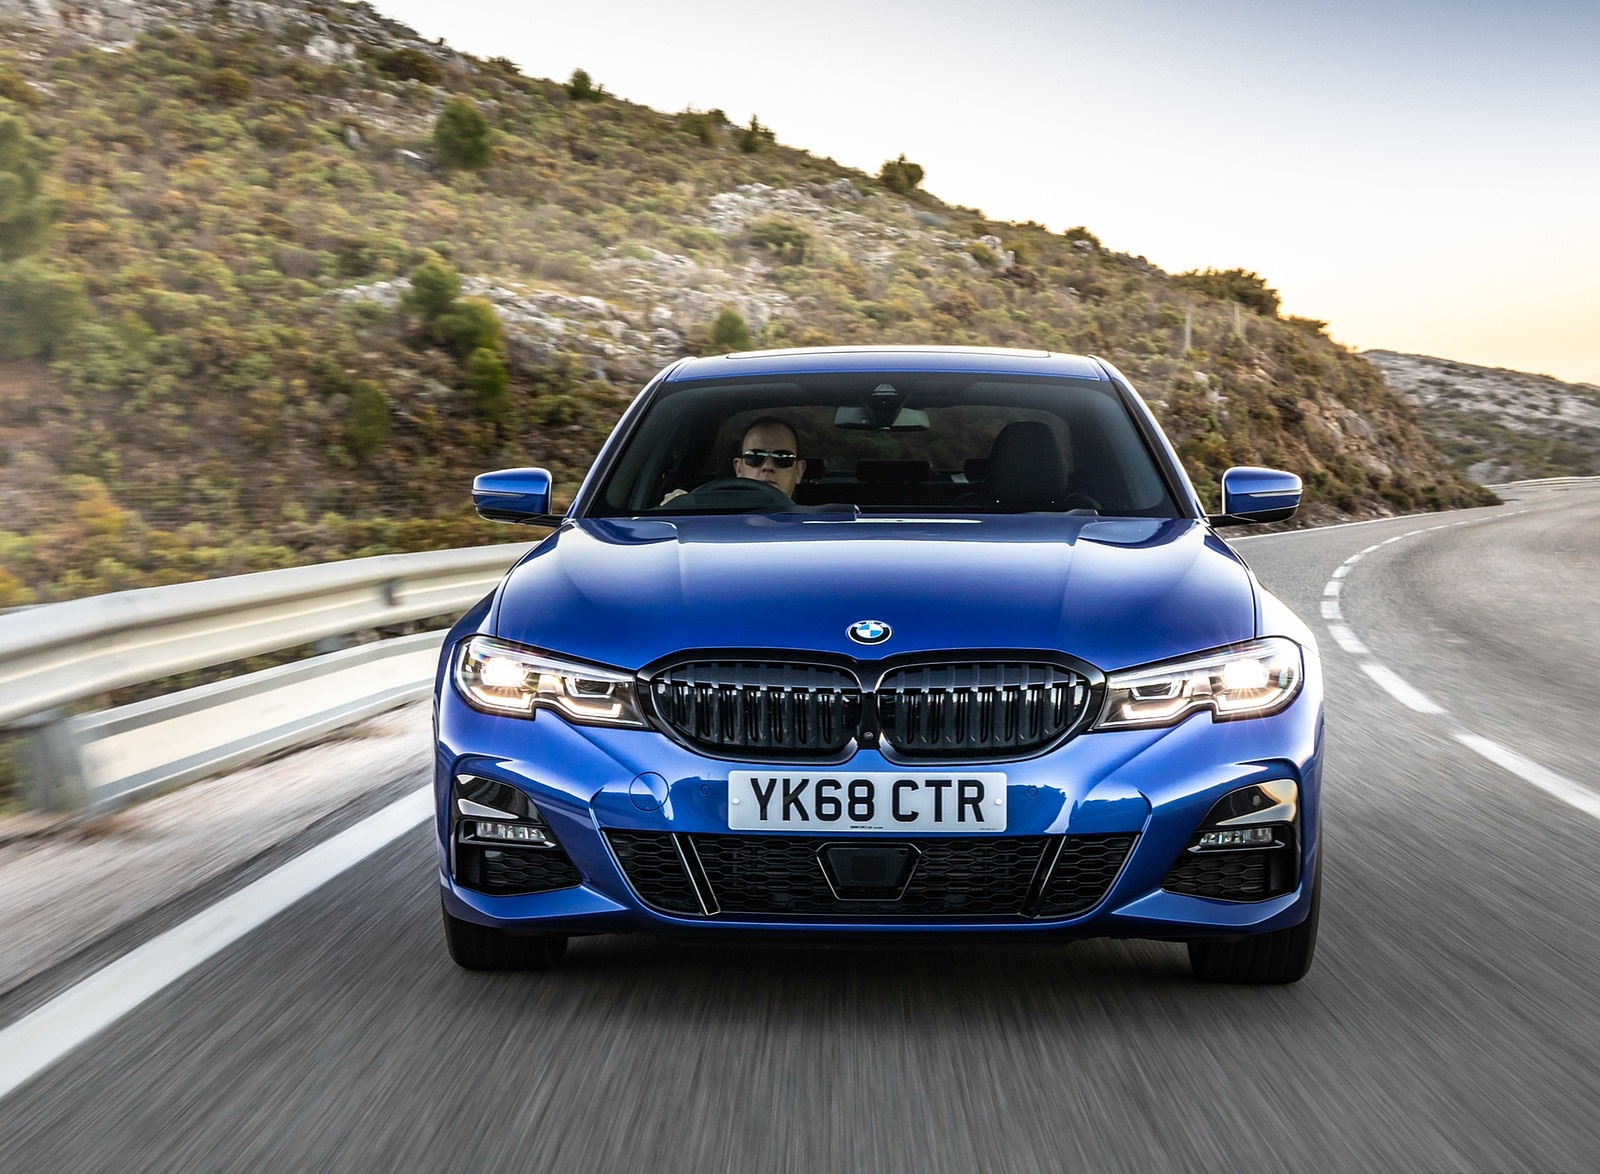 2019 BMW 3-Series Saloon 320d xDrive (UK-Spec) Front Wallpapers (15)